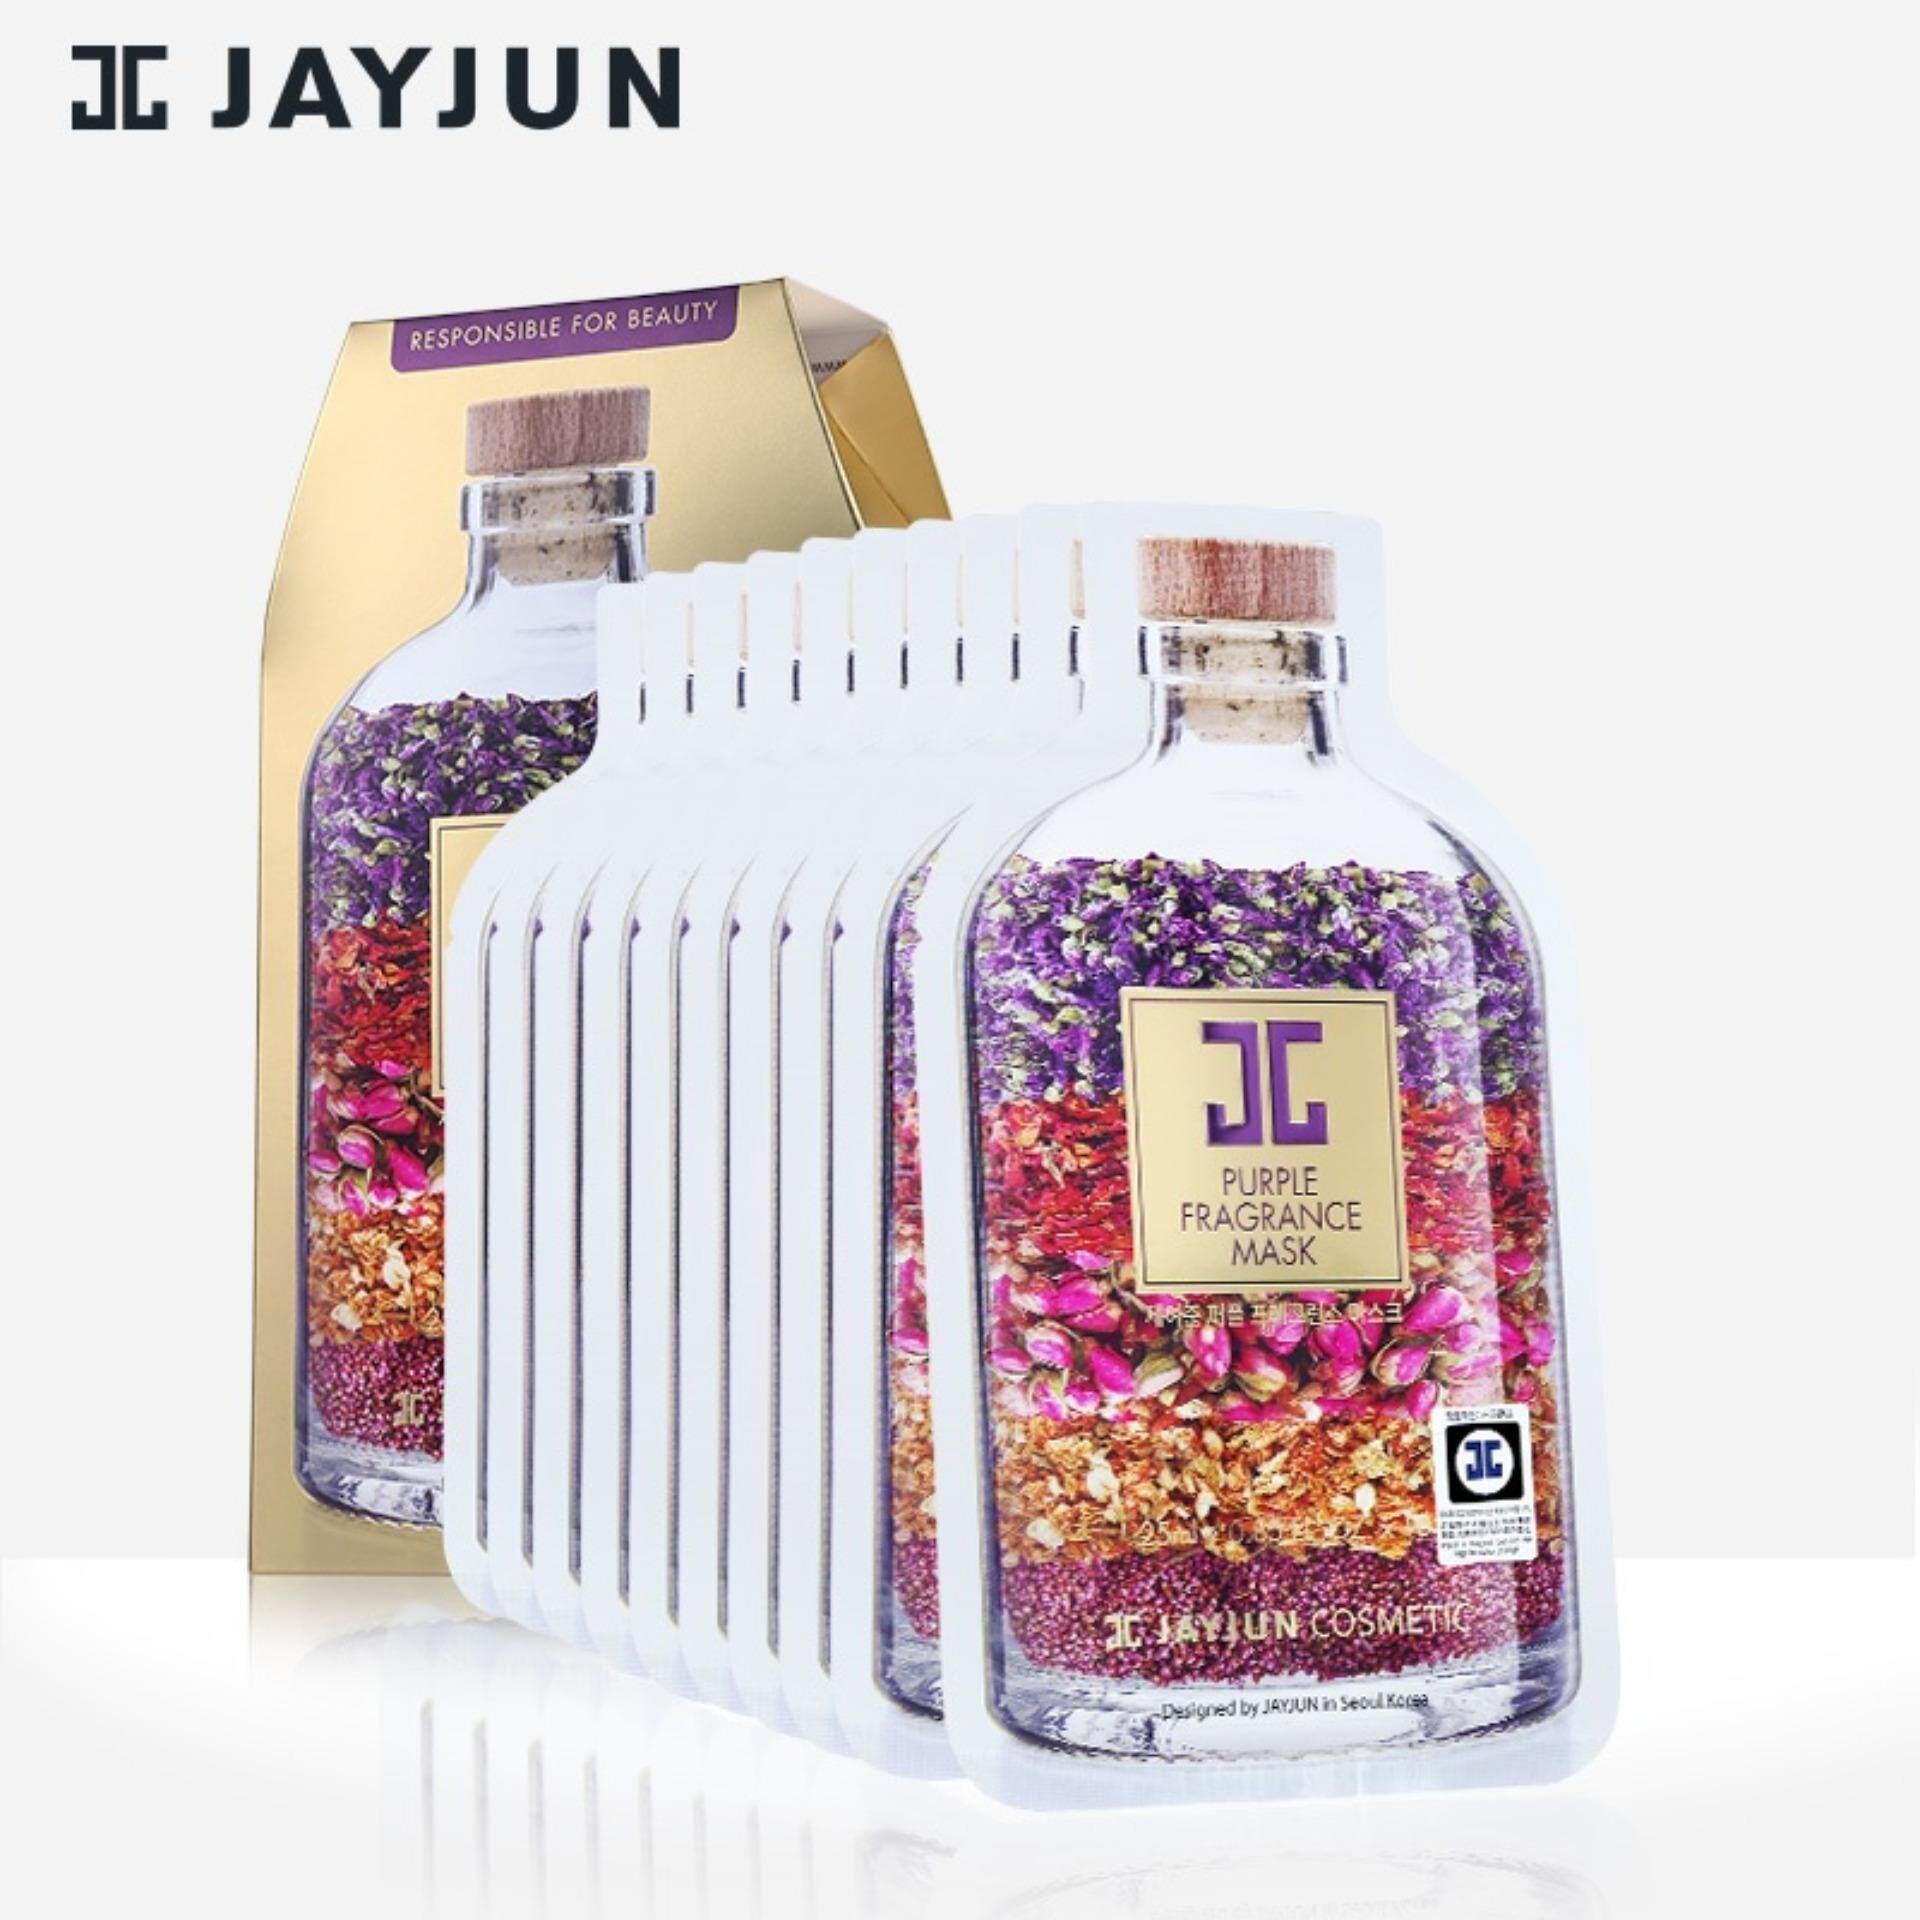 Fitur Missha Premium Aloe Sheet Mask 21g Set Of 10 Dan Harga Terbaru Rorec Olive Jayjun Purple Fragrance